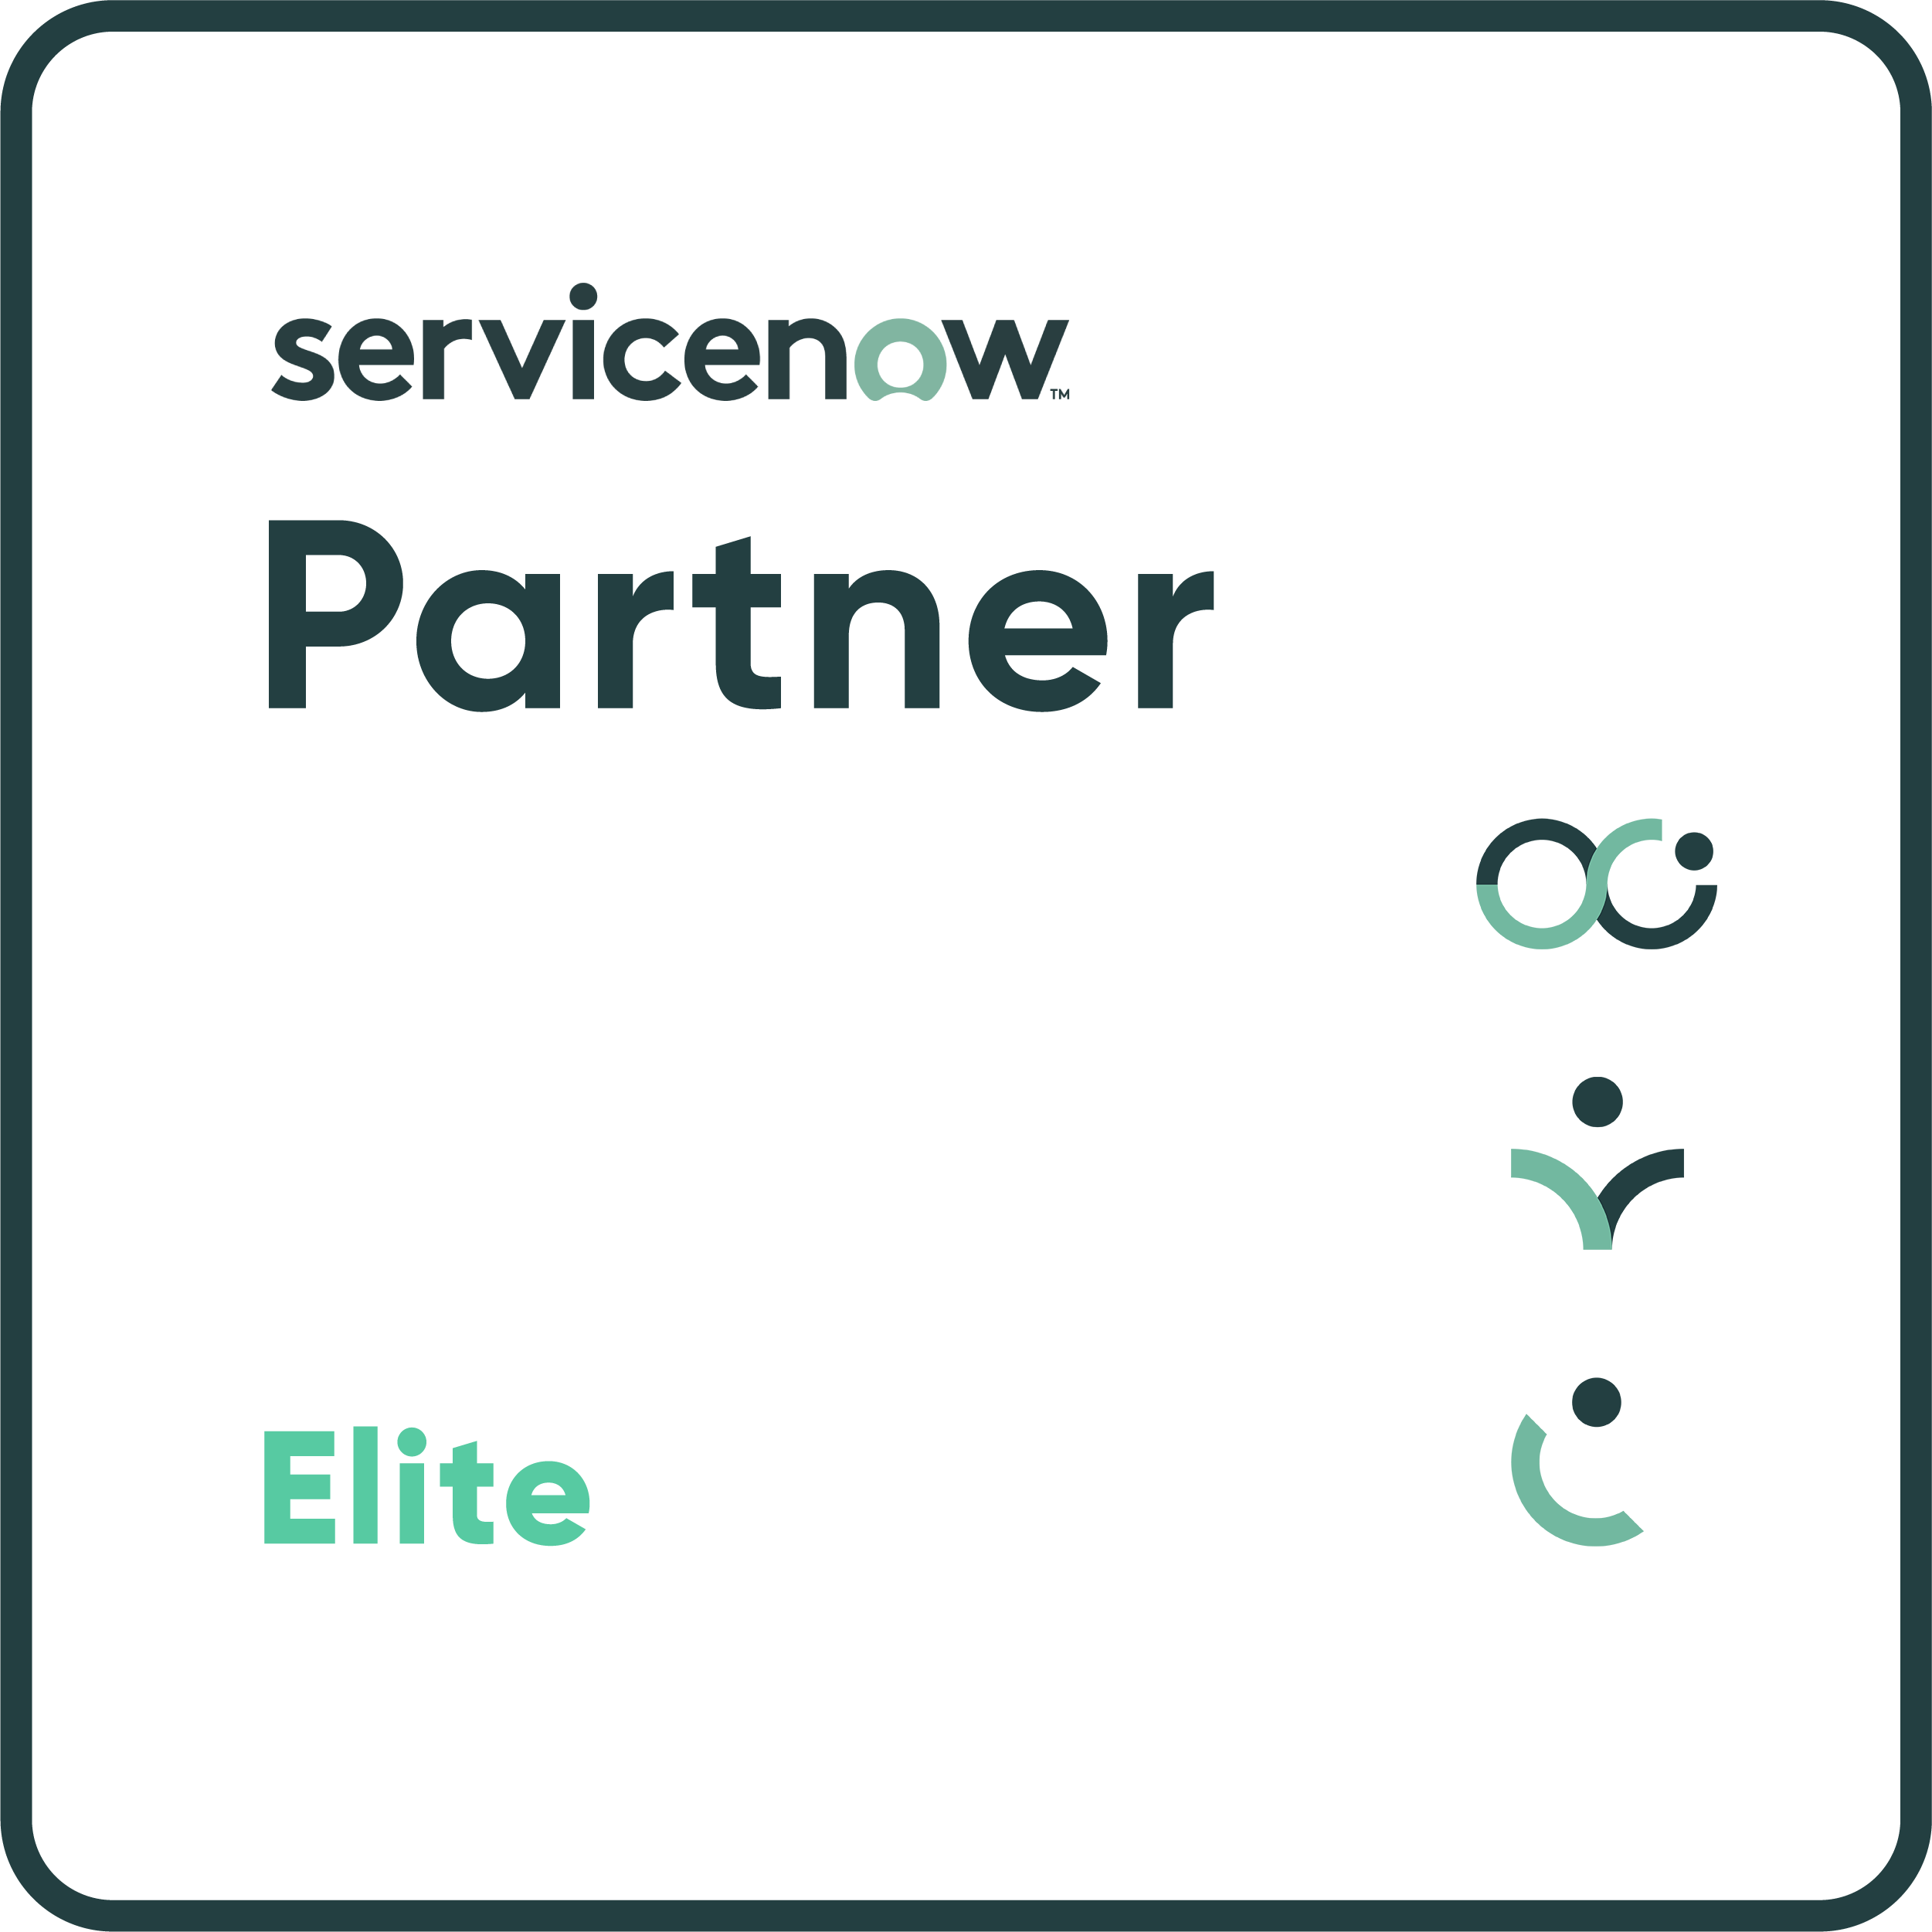 ServiceNow Elite Partner